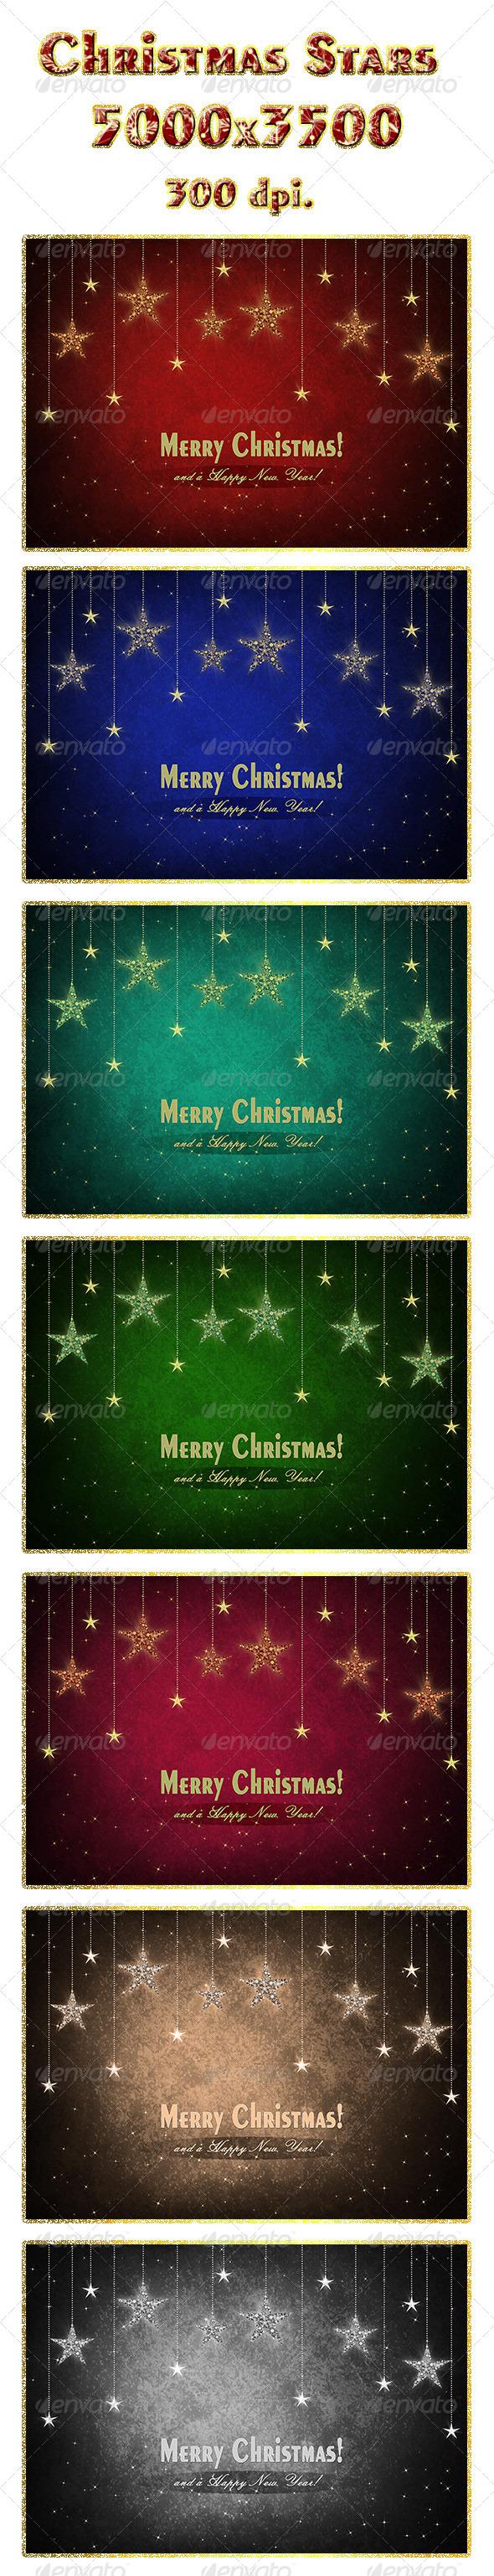 GraphicRiver Christmas Stars 6159266